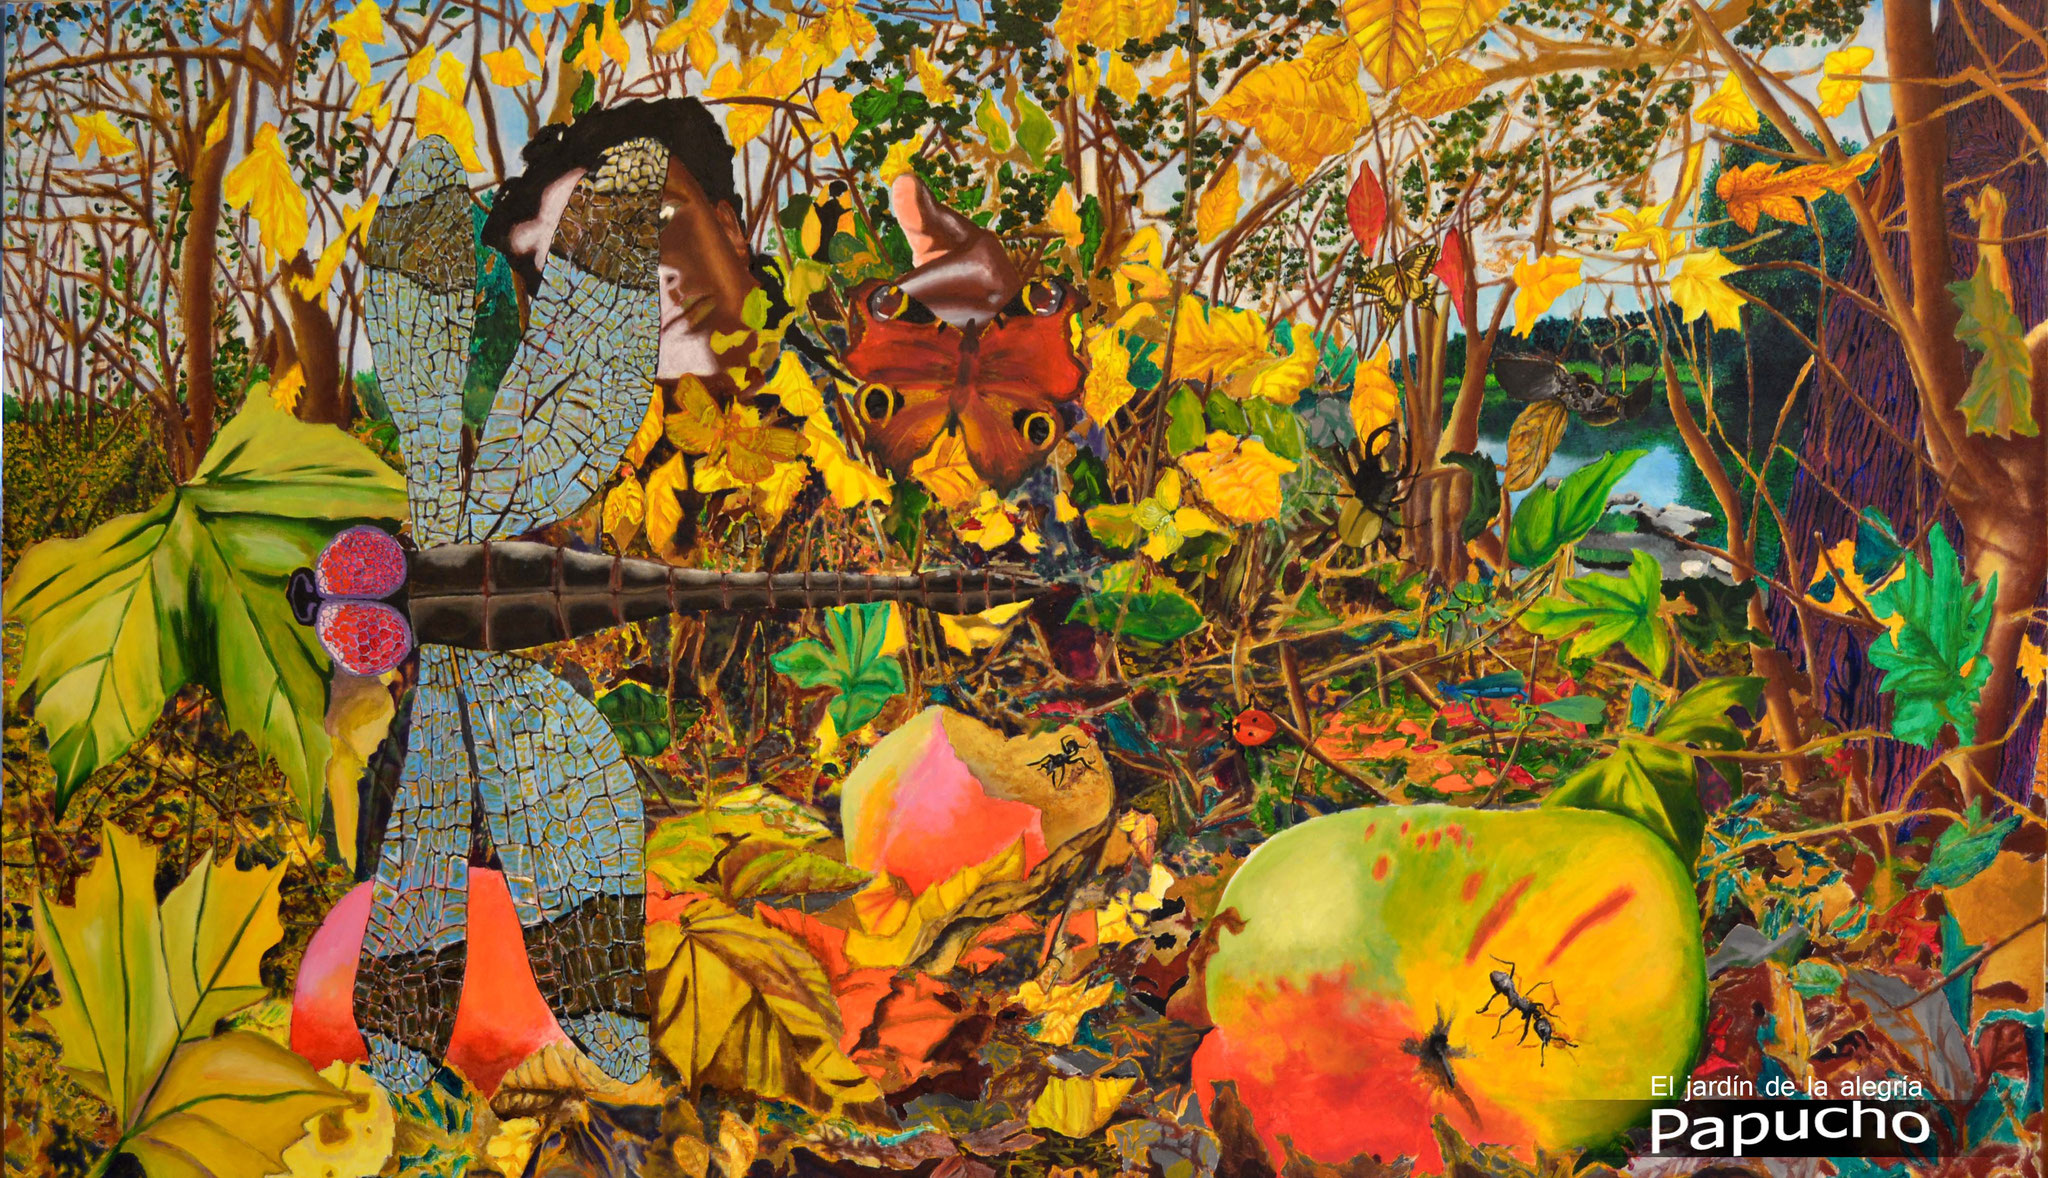 El jardín de la alegría/Acryl und Öl auf Leinwand/115x200cm. (als Original Verfügbar)